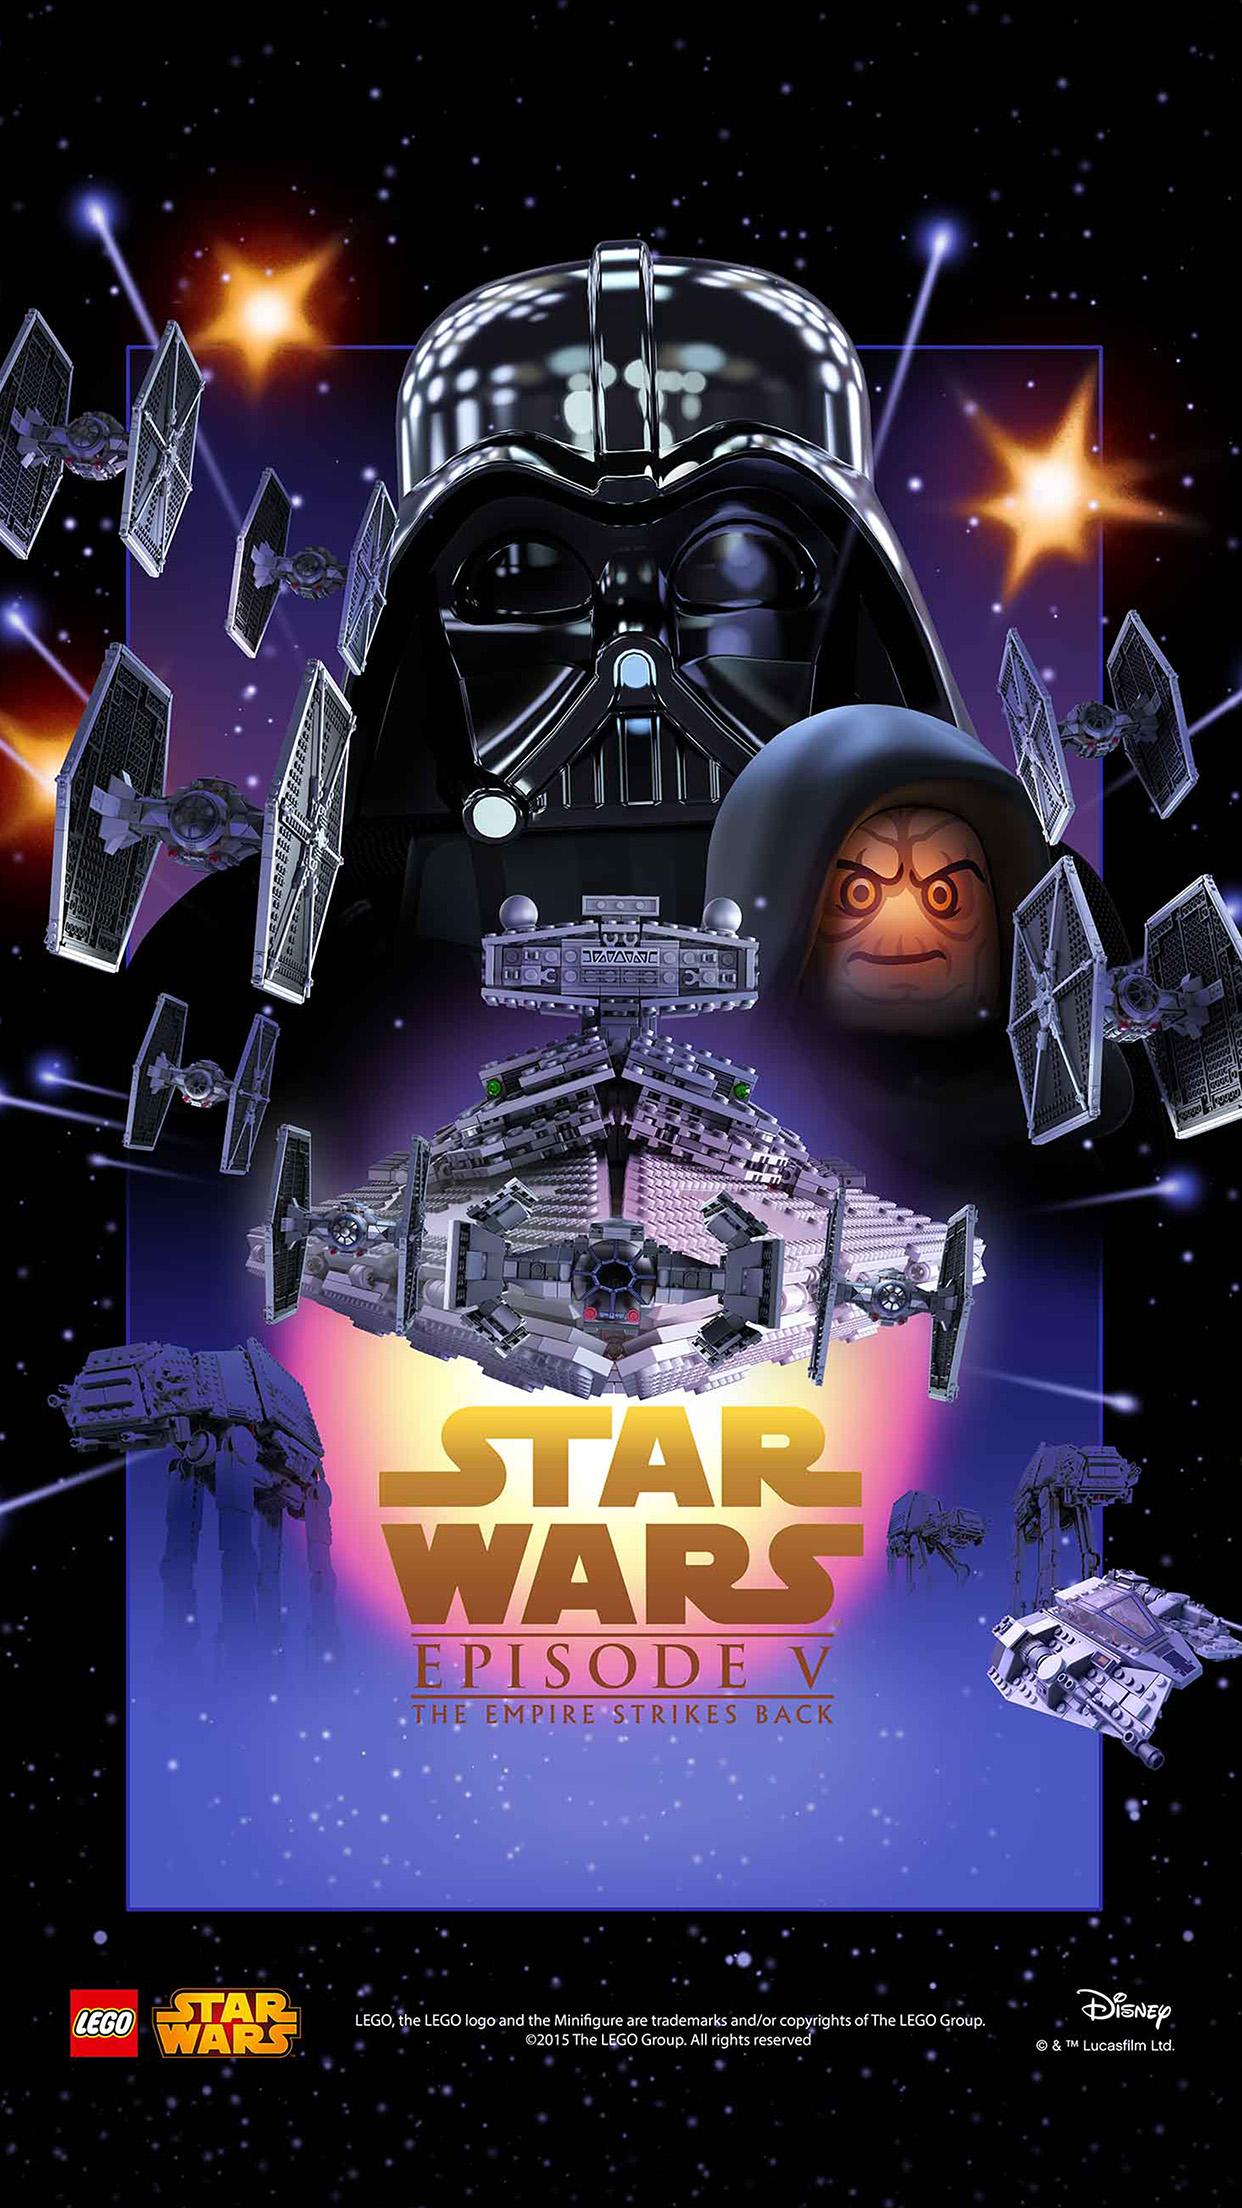 164 1647098 starwars lego episode 5 empire strikes back film